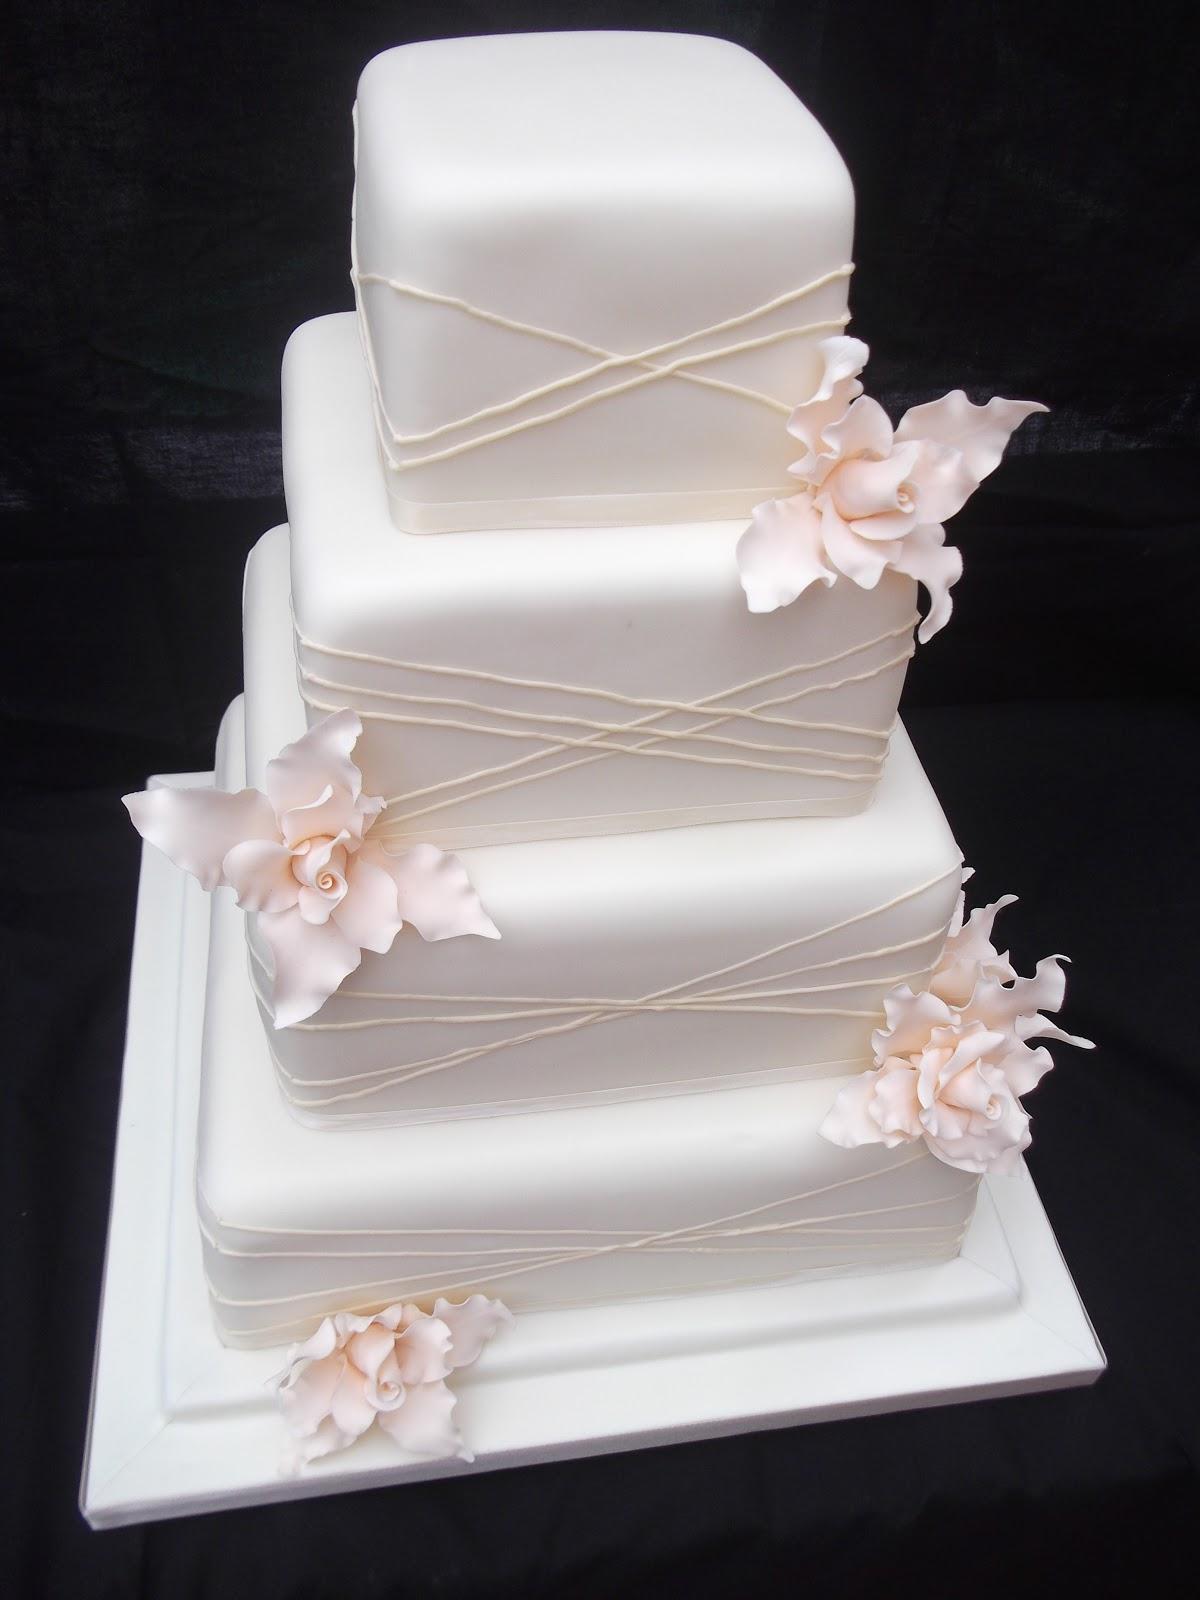 Wedding Cake Art Karen Hill : Cakes By Karen: Ivory wedding cake with champagne flowers